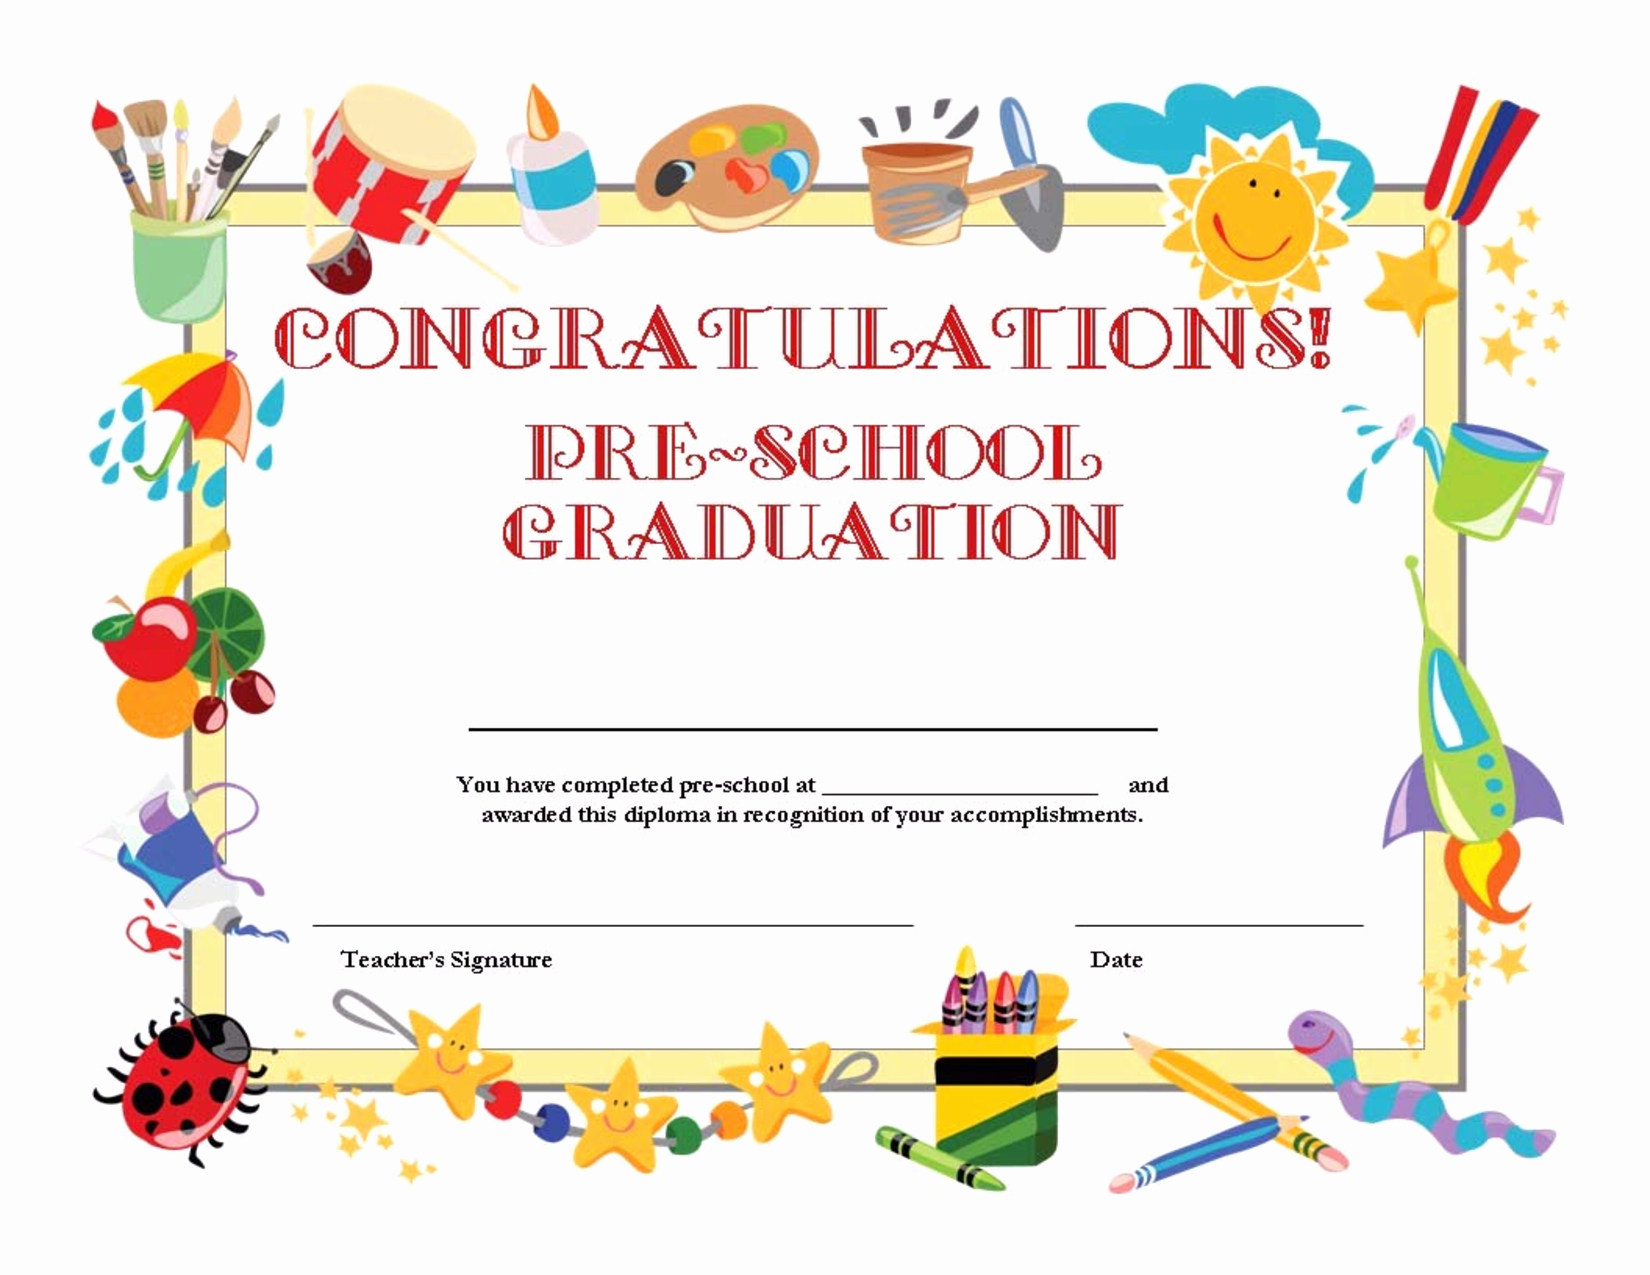 Preschool Graduation Certificate Free Printable New Preschool Graduation Certificate Template Free